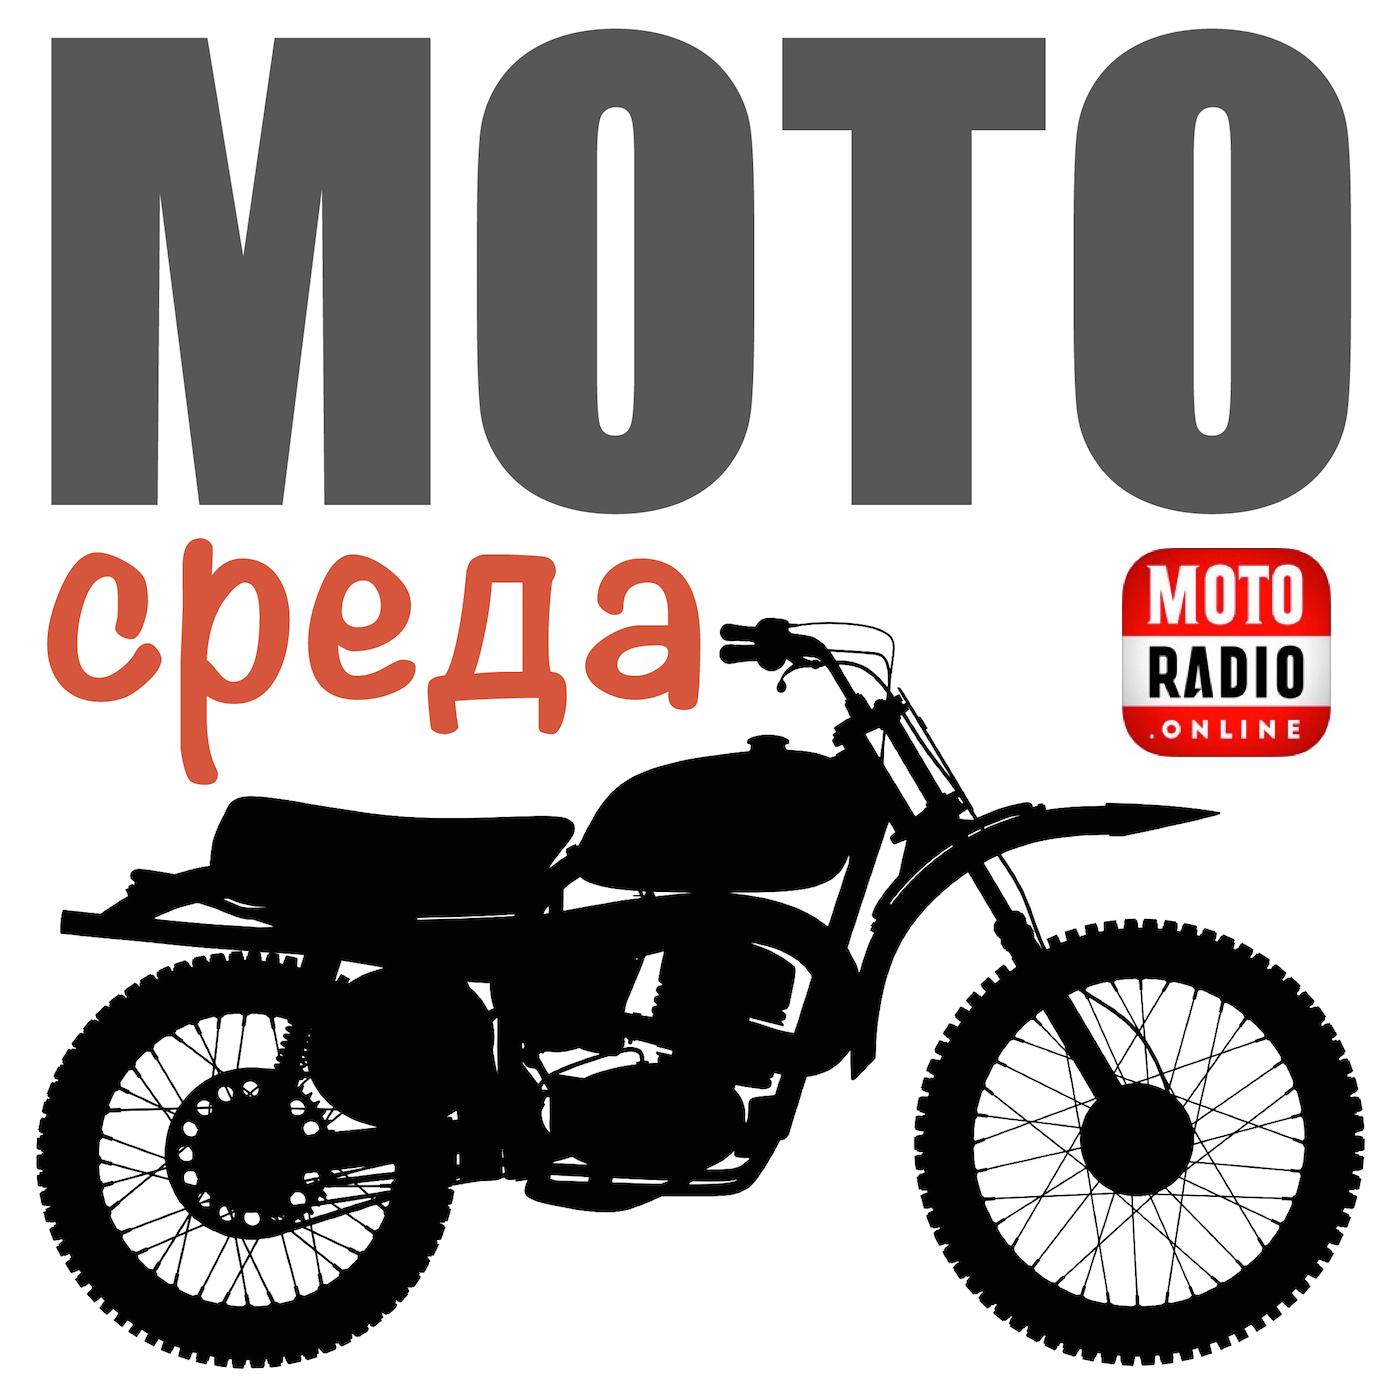 цена на Олег Капкаев Ненастоящие запчасти для мотоциклов. Байки про Байки с Алексеем Марченко.